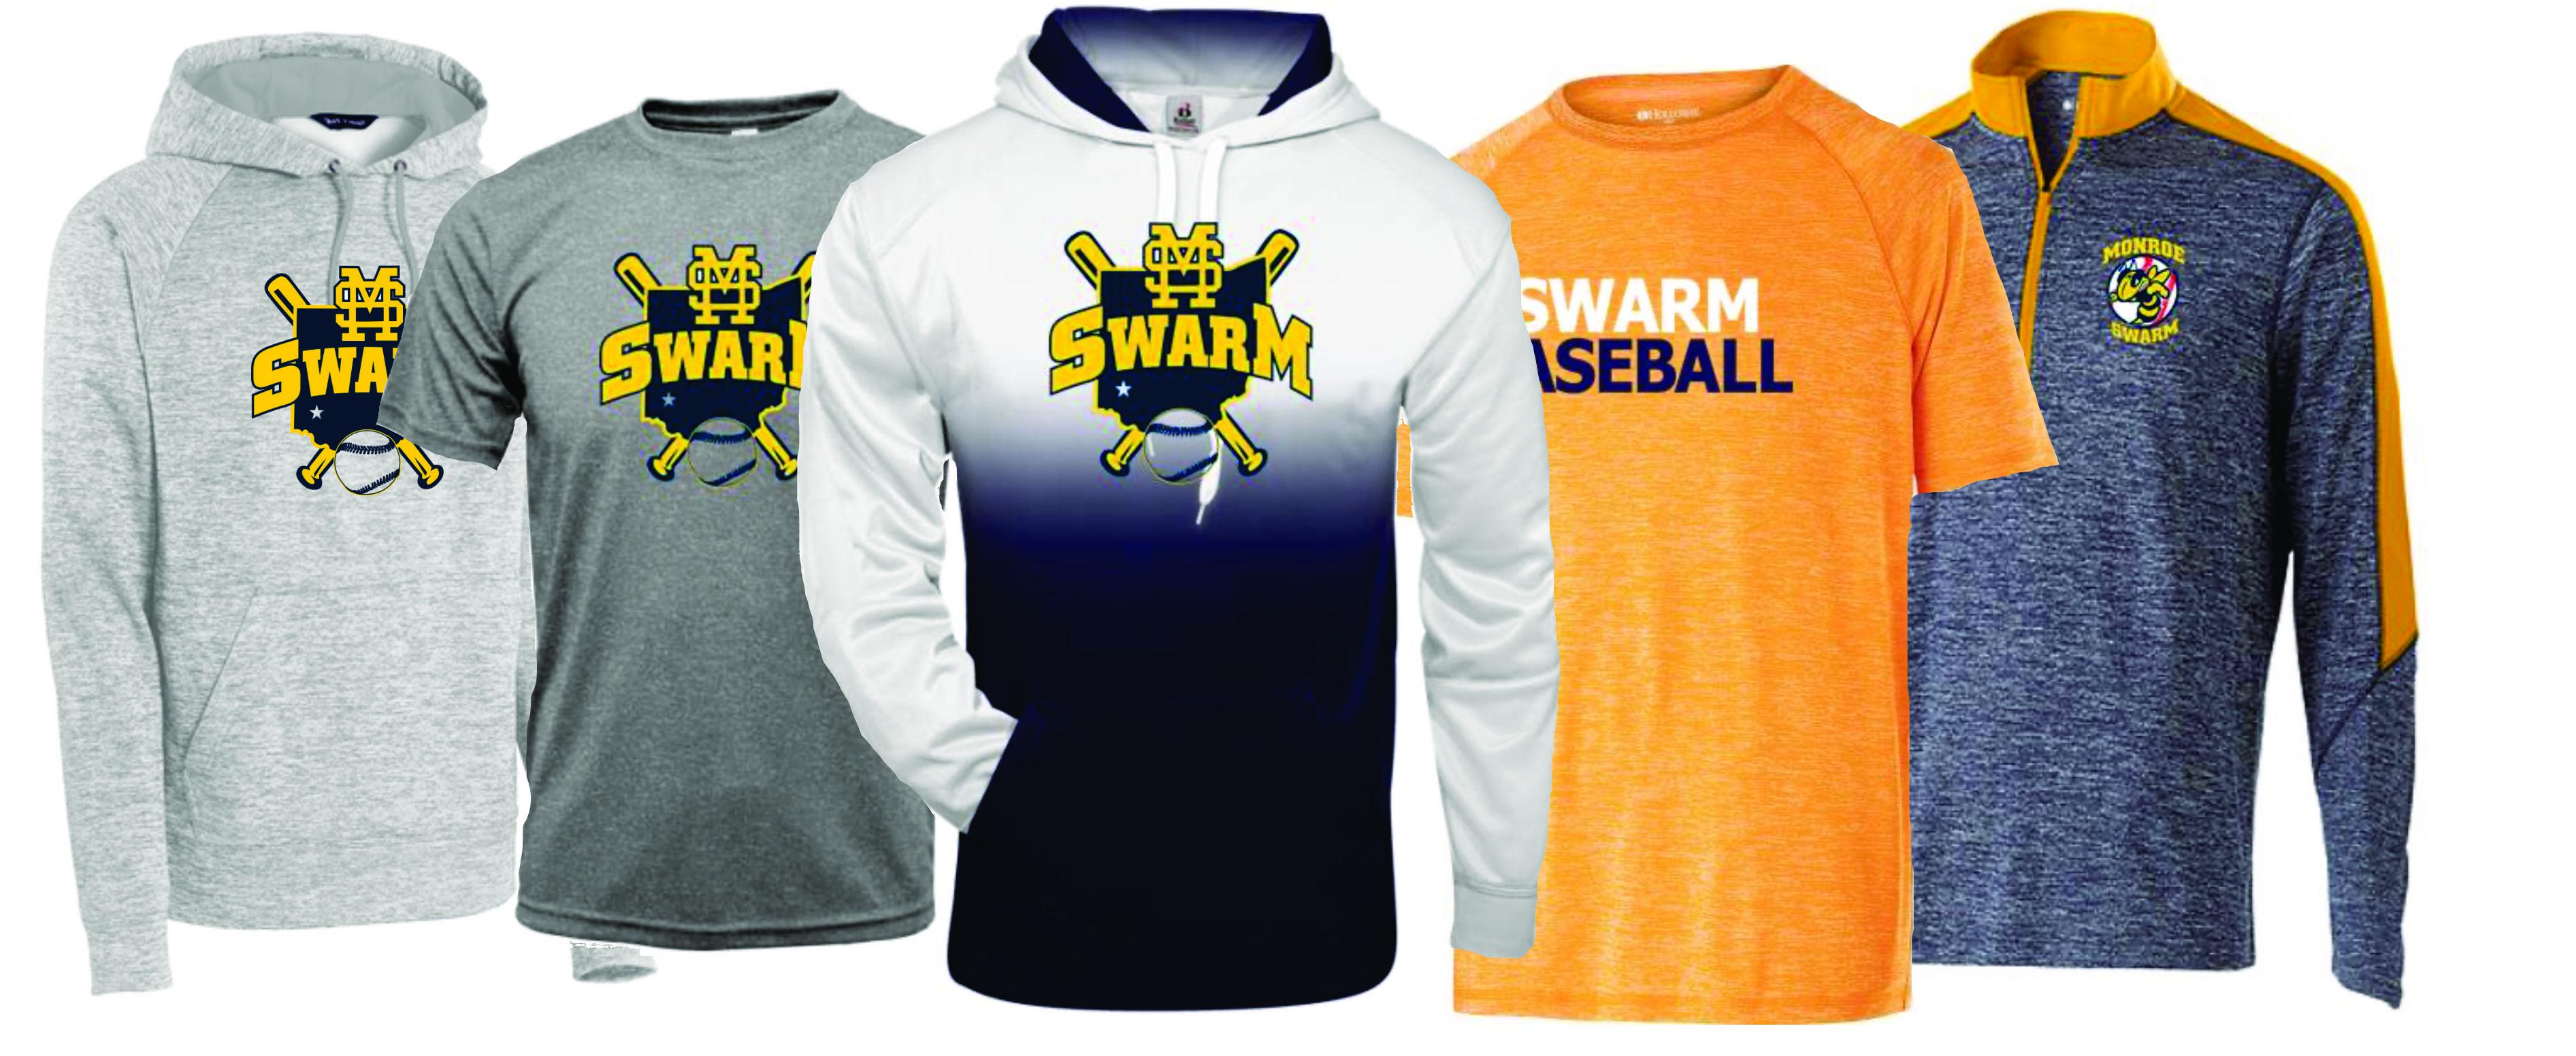 swarm-order-now-1.jpg